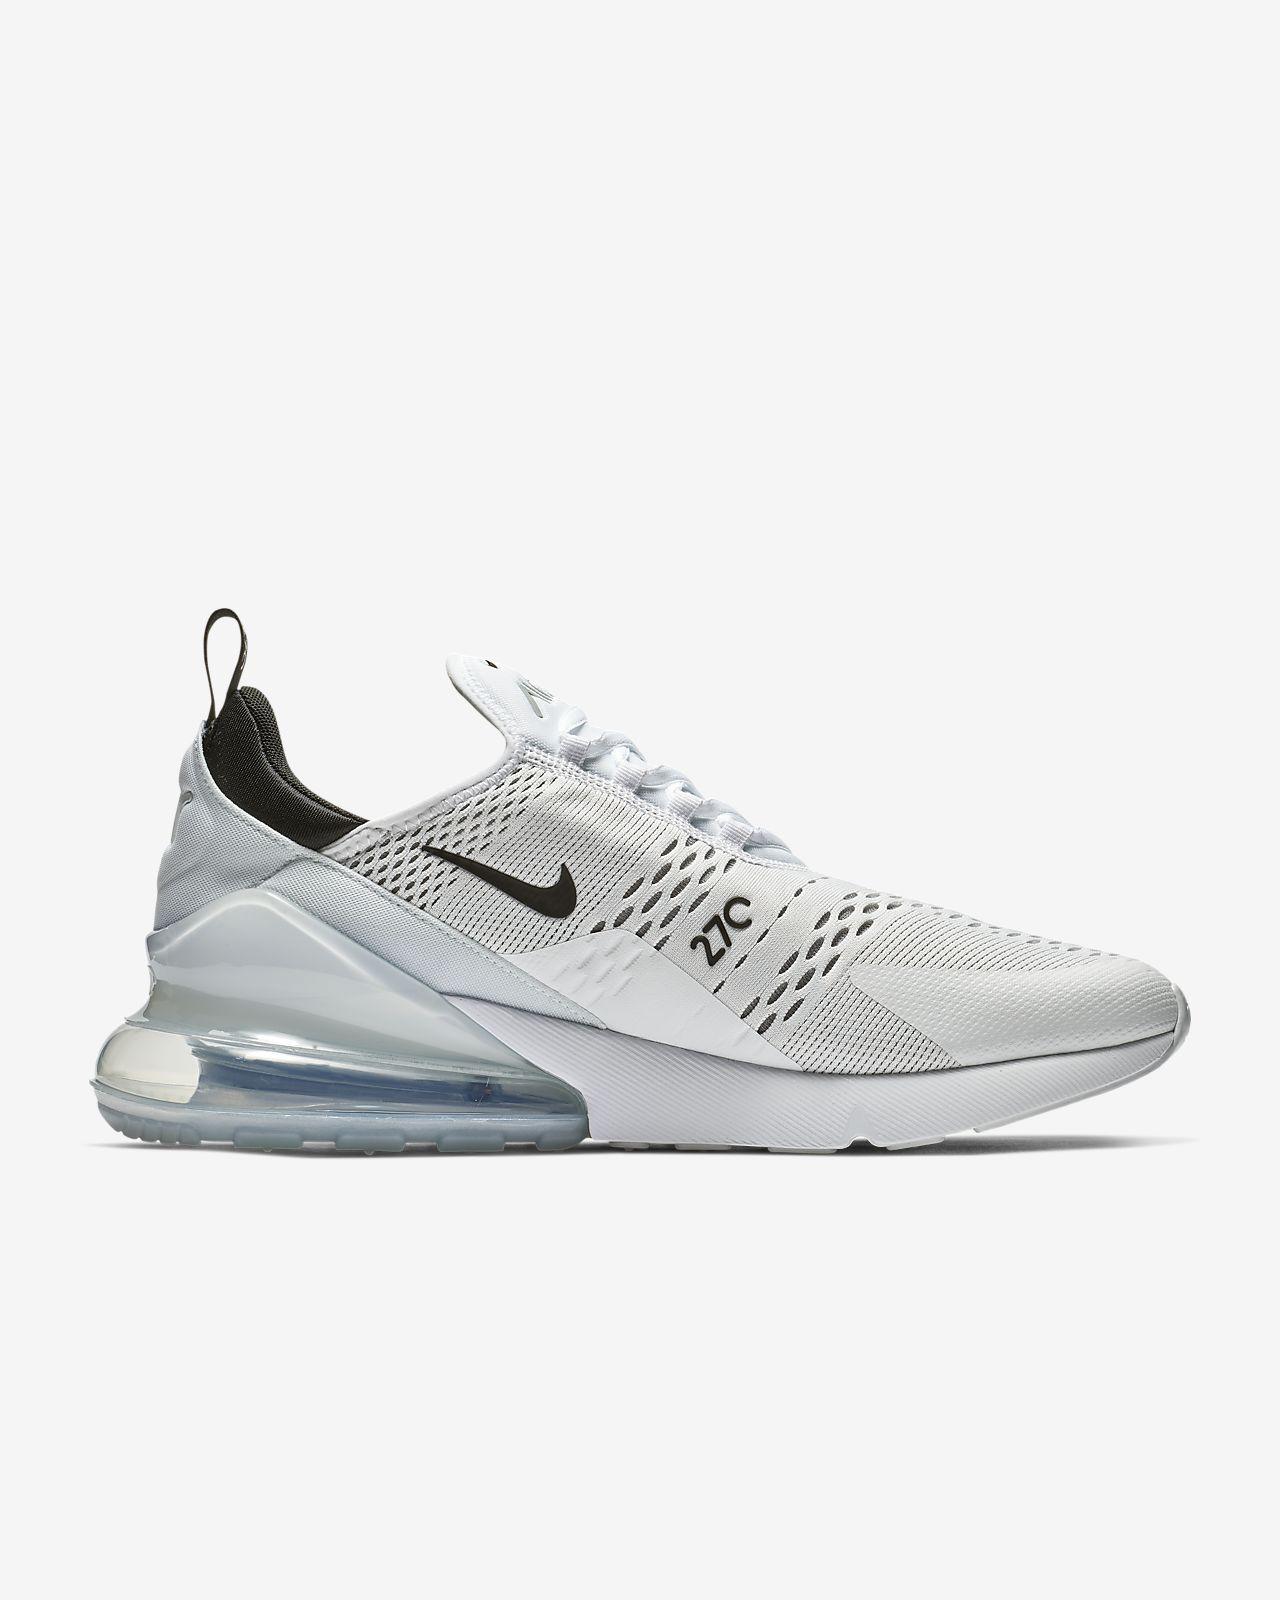 hot sale online 92584 feb7f Nike Air Max 270 Herenschoen. Nike.com NL